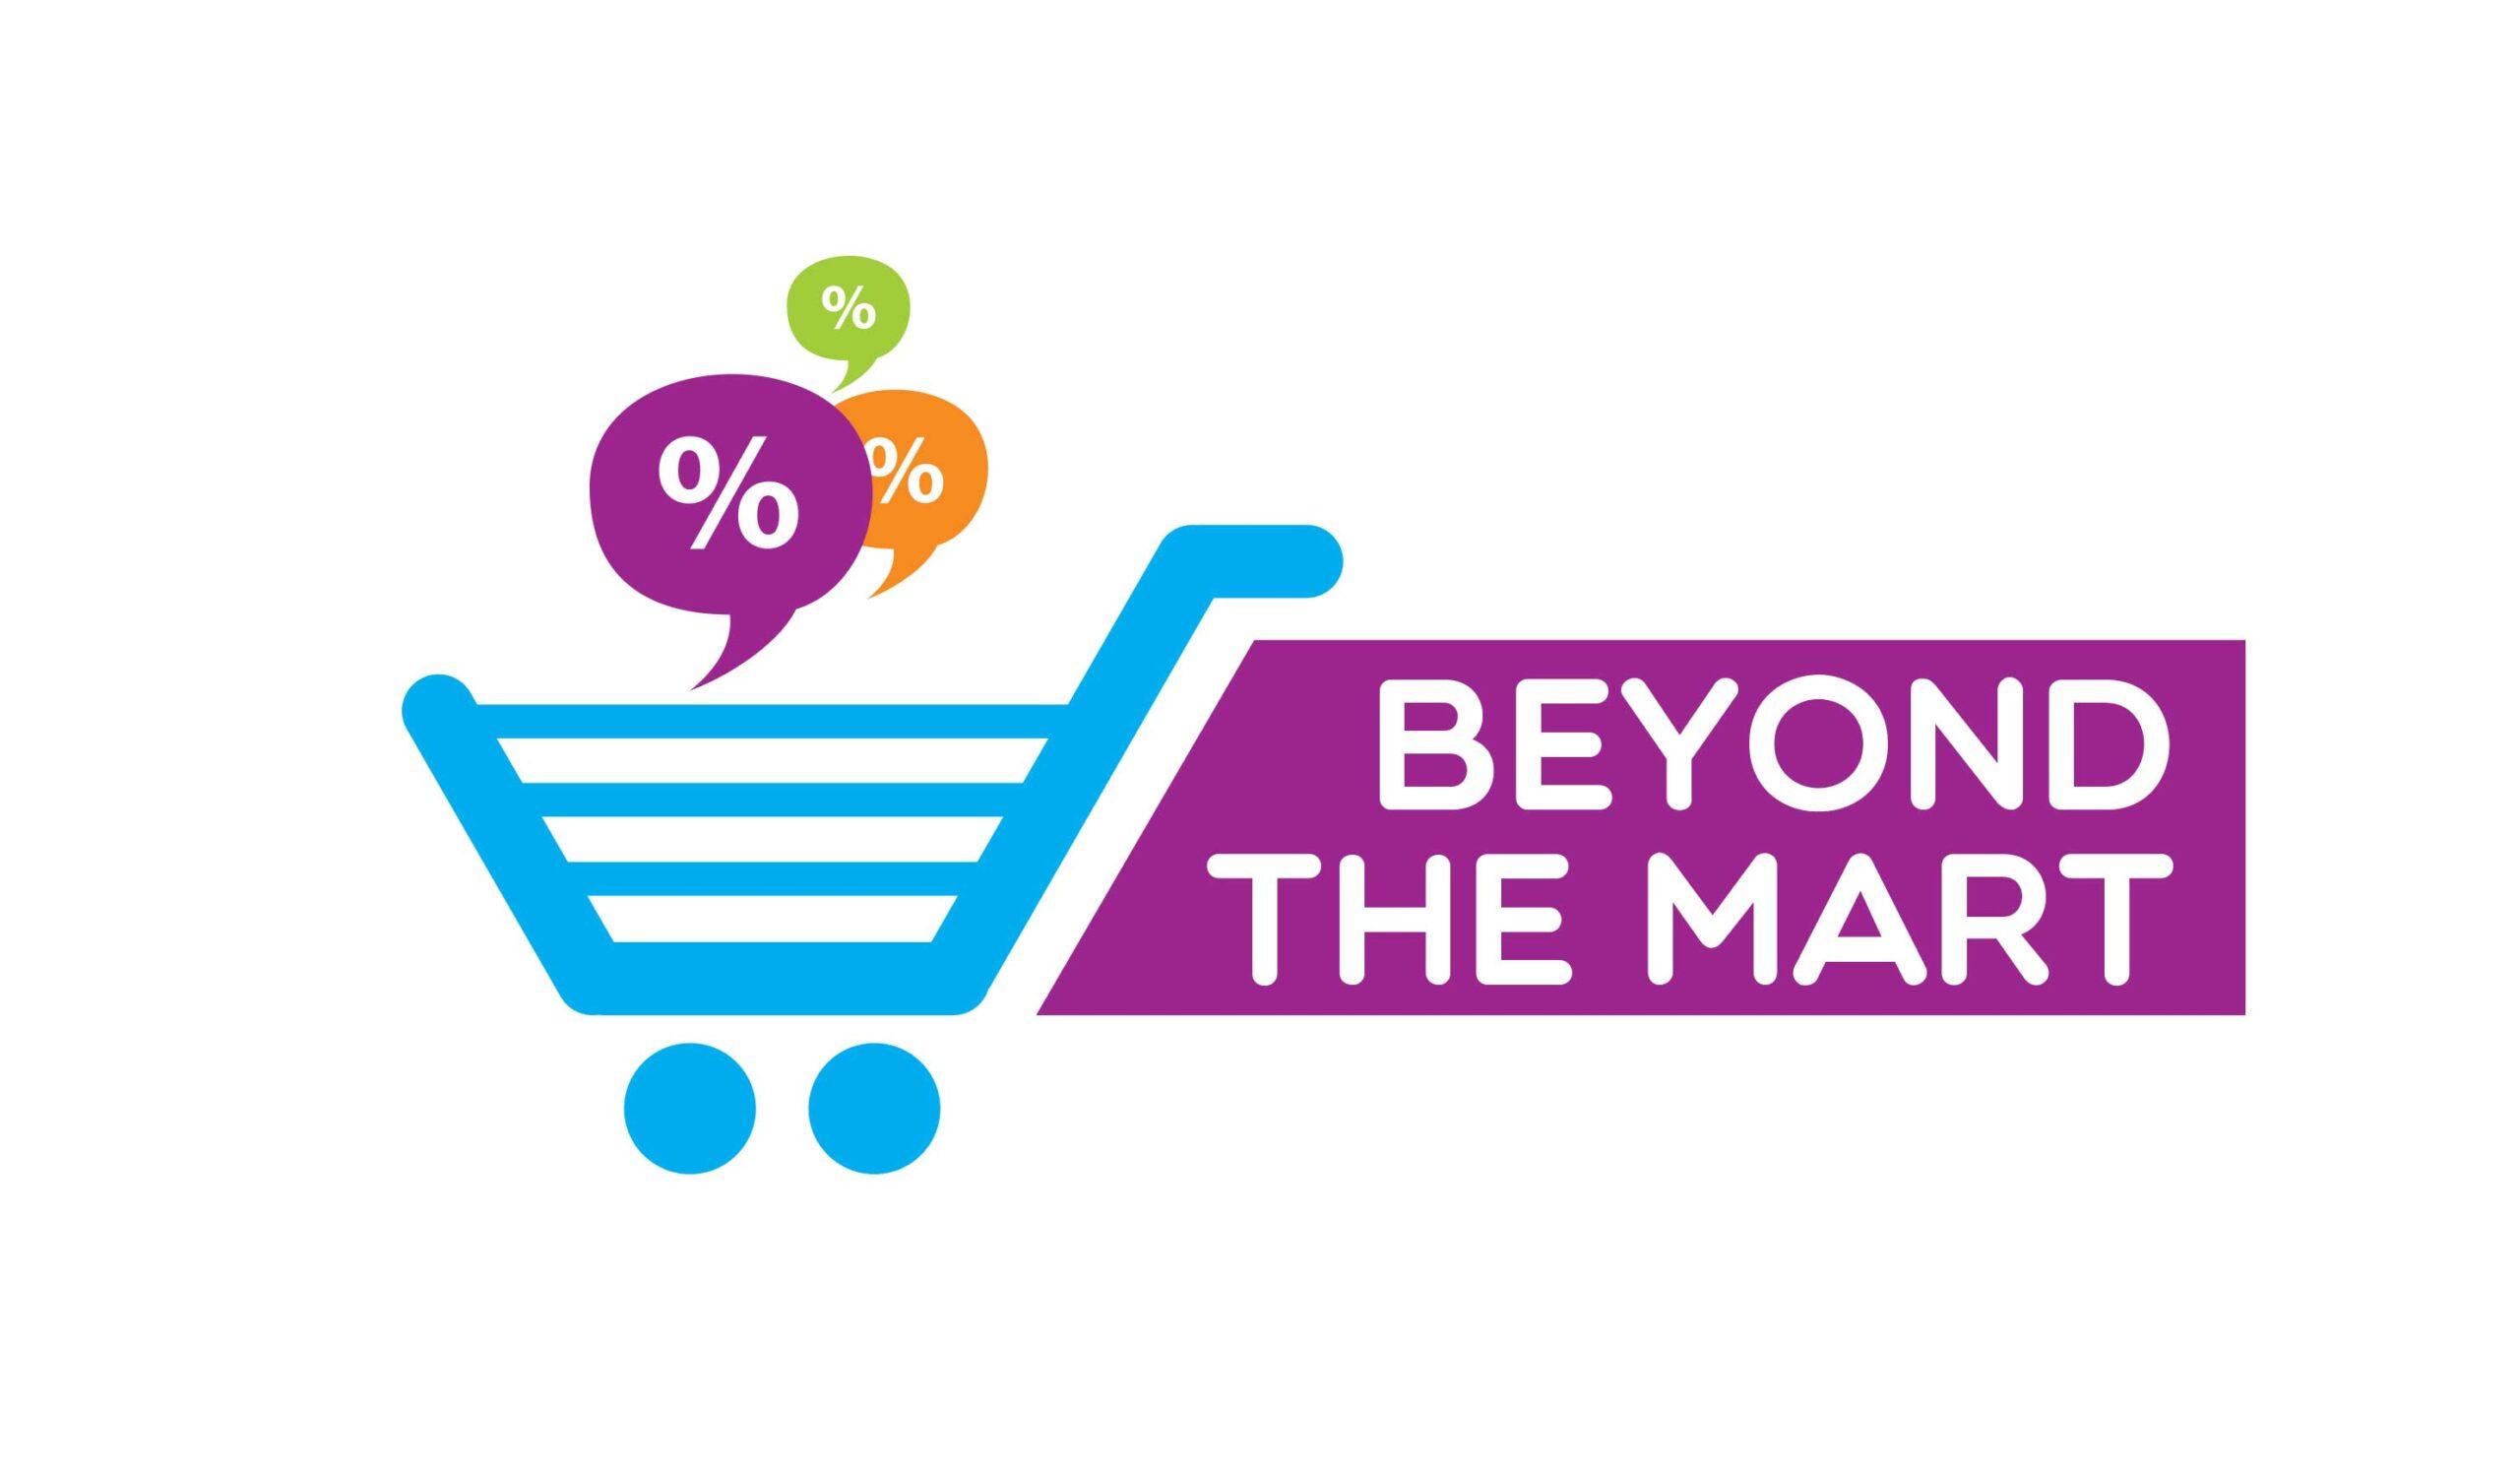 Beyond The Mart